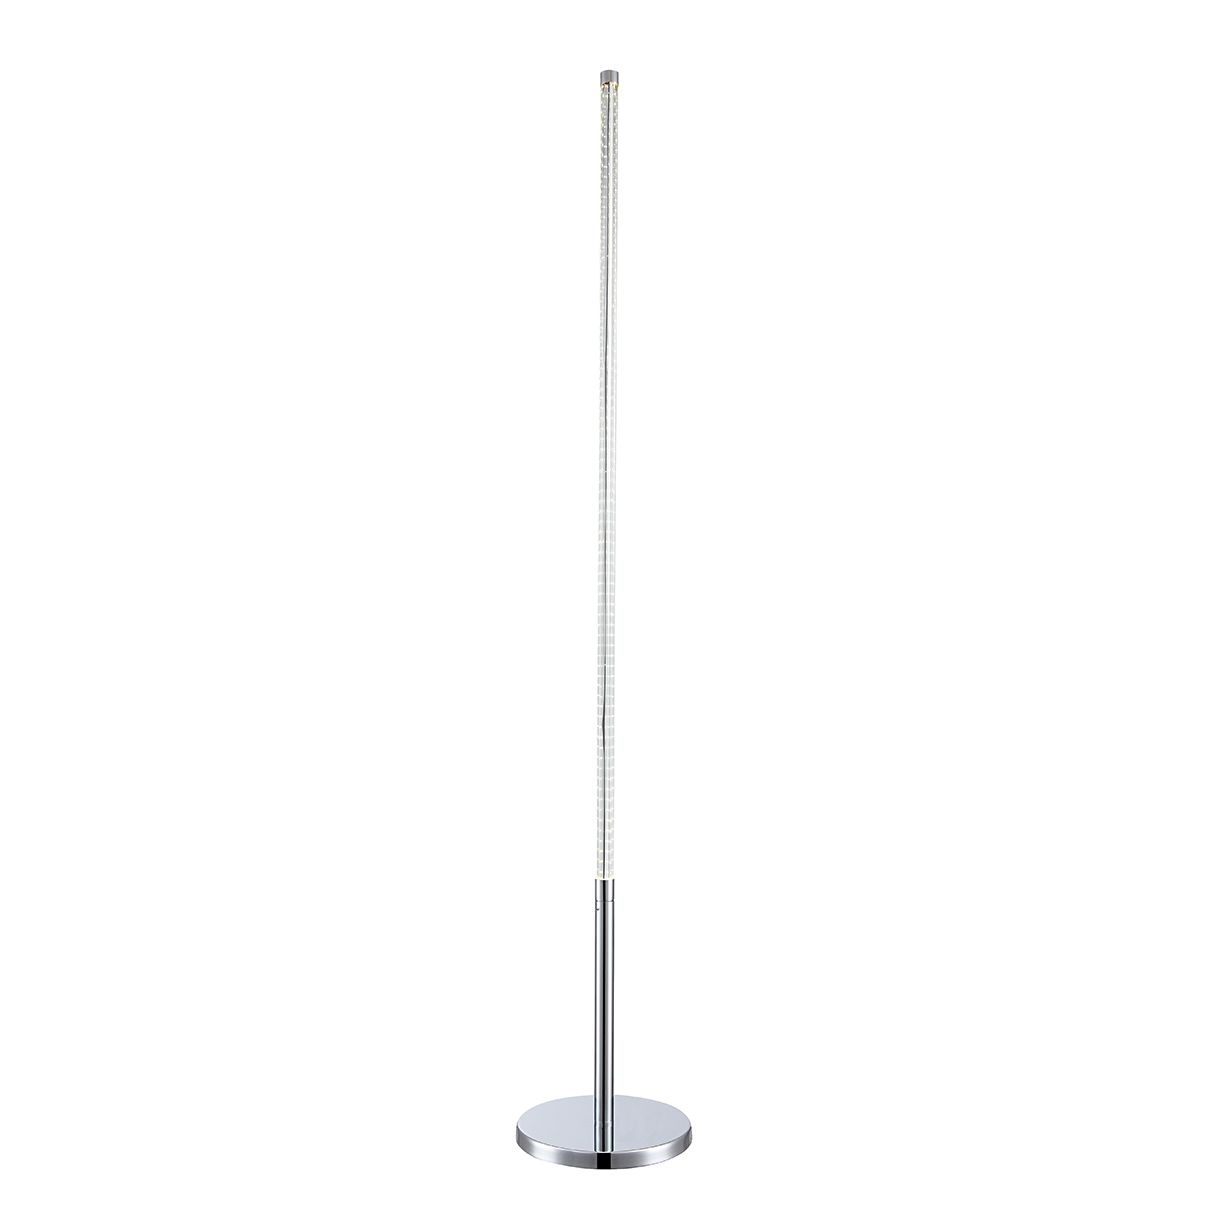 LED-Stehleuchte 1-flammig ● Silber Metall- verchromt- Globo Lighting A+